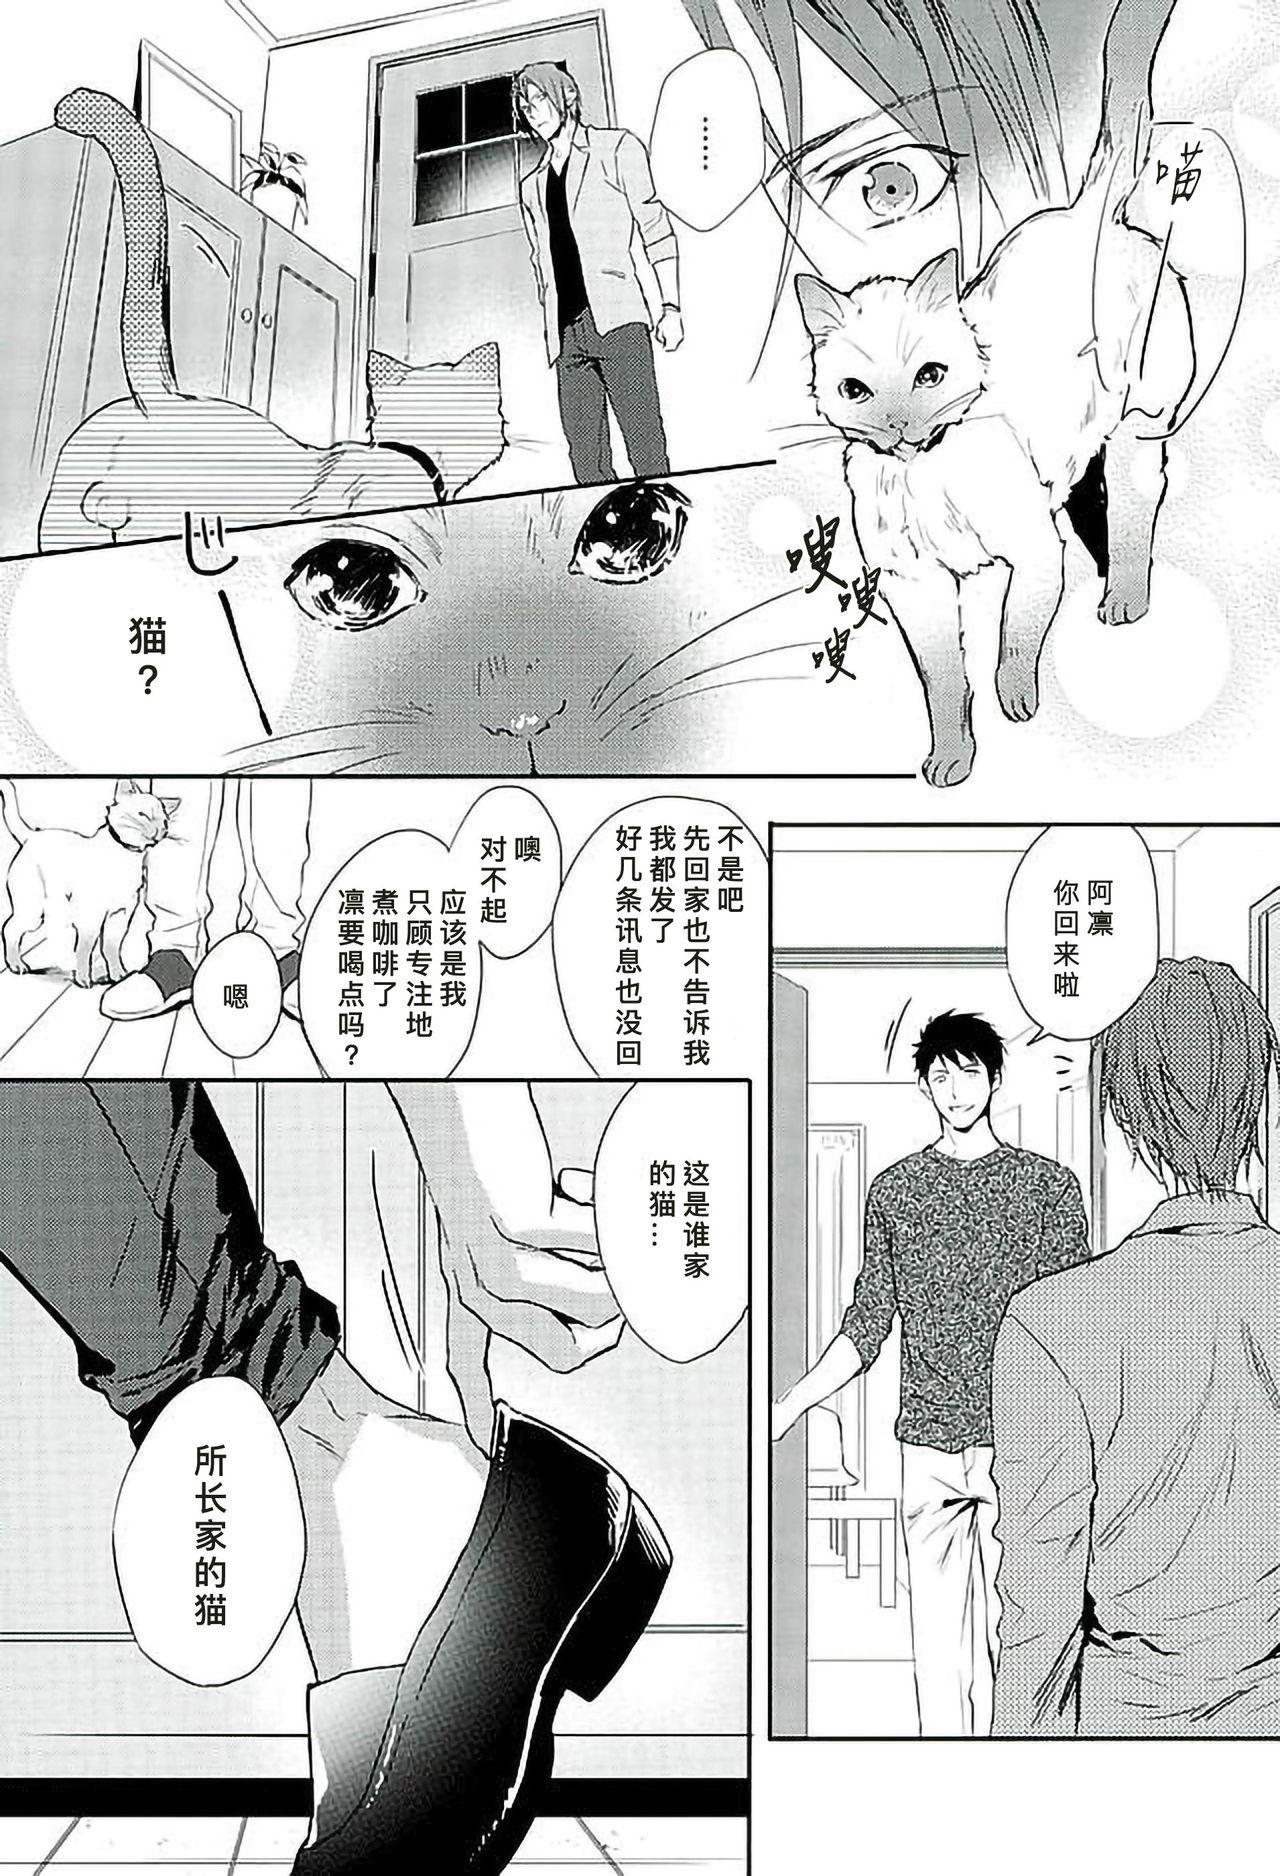 我家的喵主子 Wagaya no Nyanko-sama 6